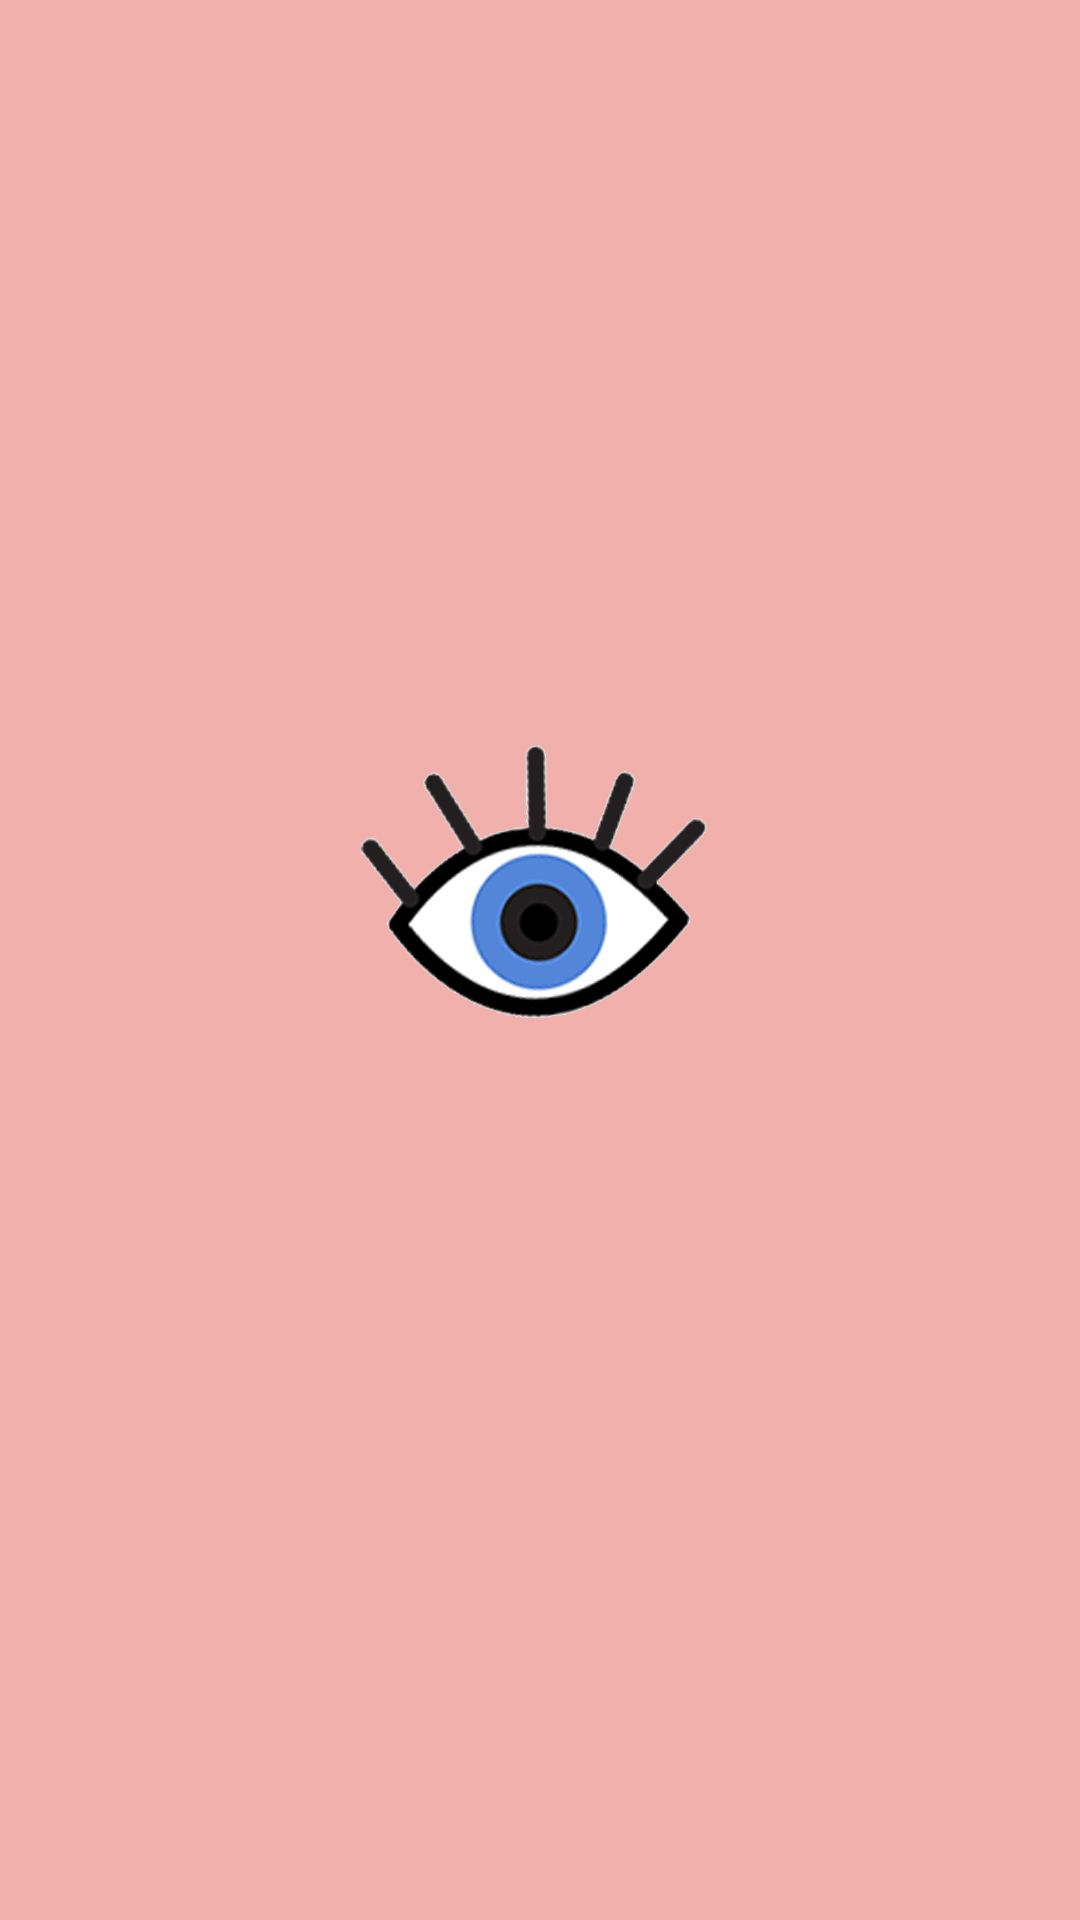 Fondo De Ojos, Fondos De Pantalla